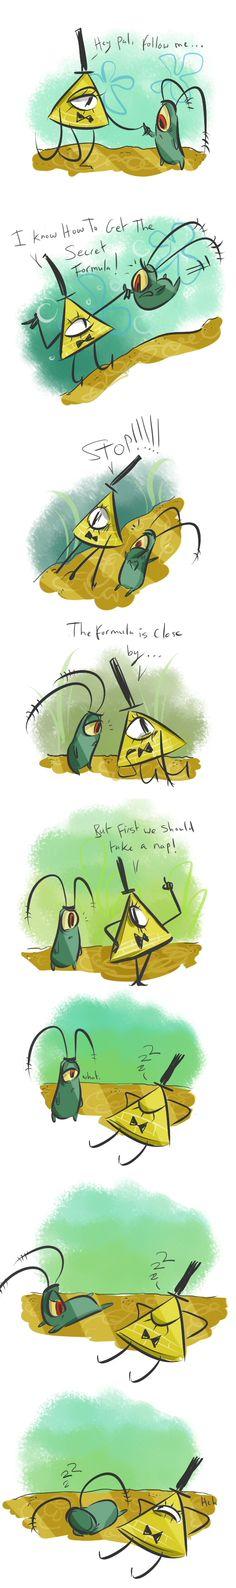 bill be trollin by coffeebandit.deviantart.com on @DeviantArt